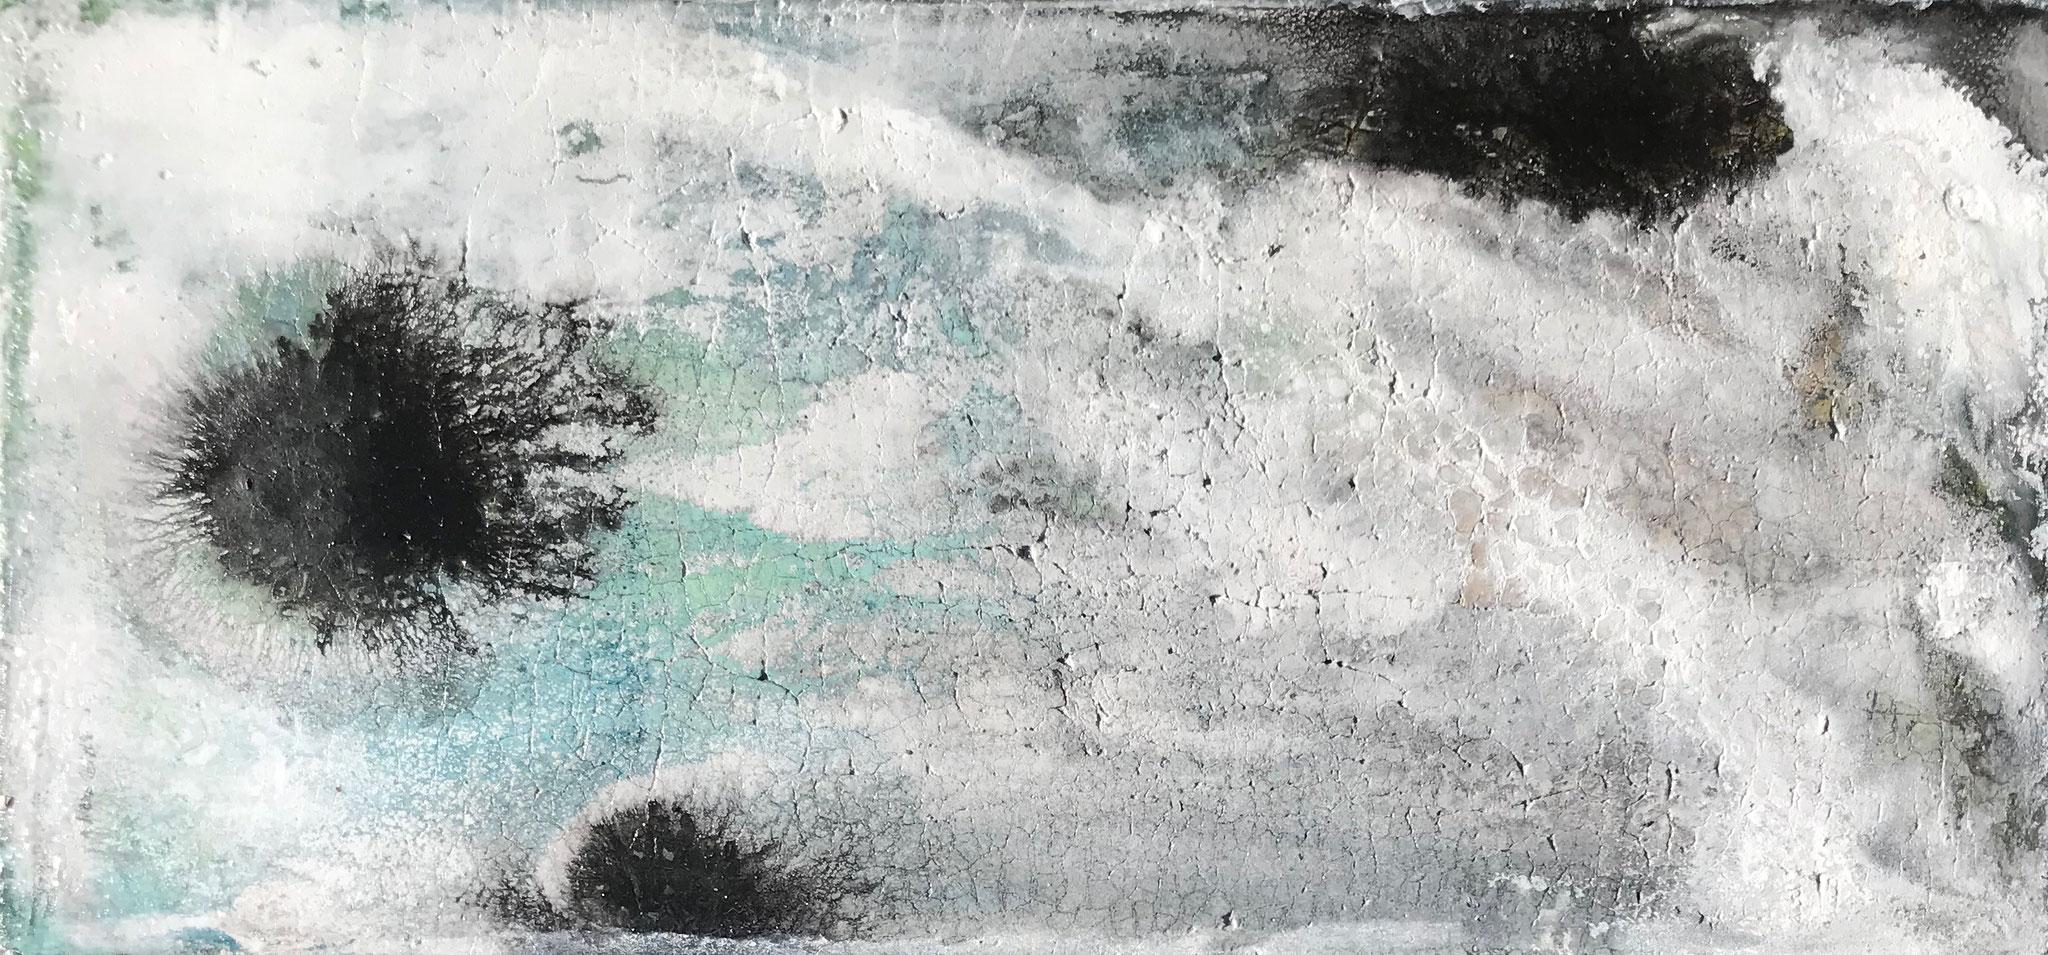 #13 Holzkiste - rechteckig - ca. 24 x 11 x 7 cm (L/B/H)